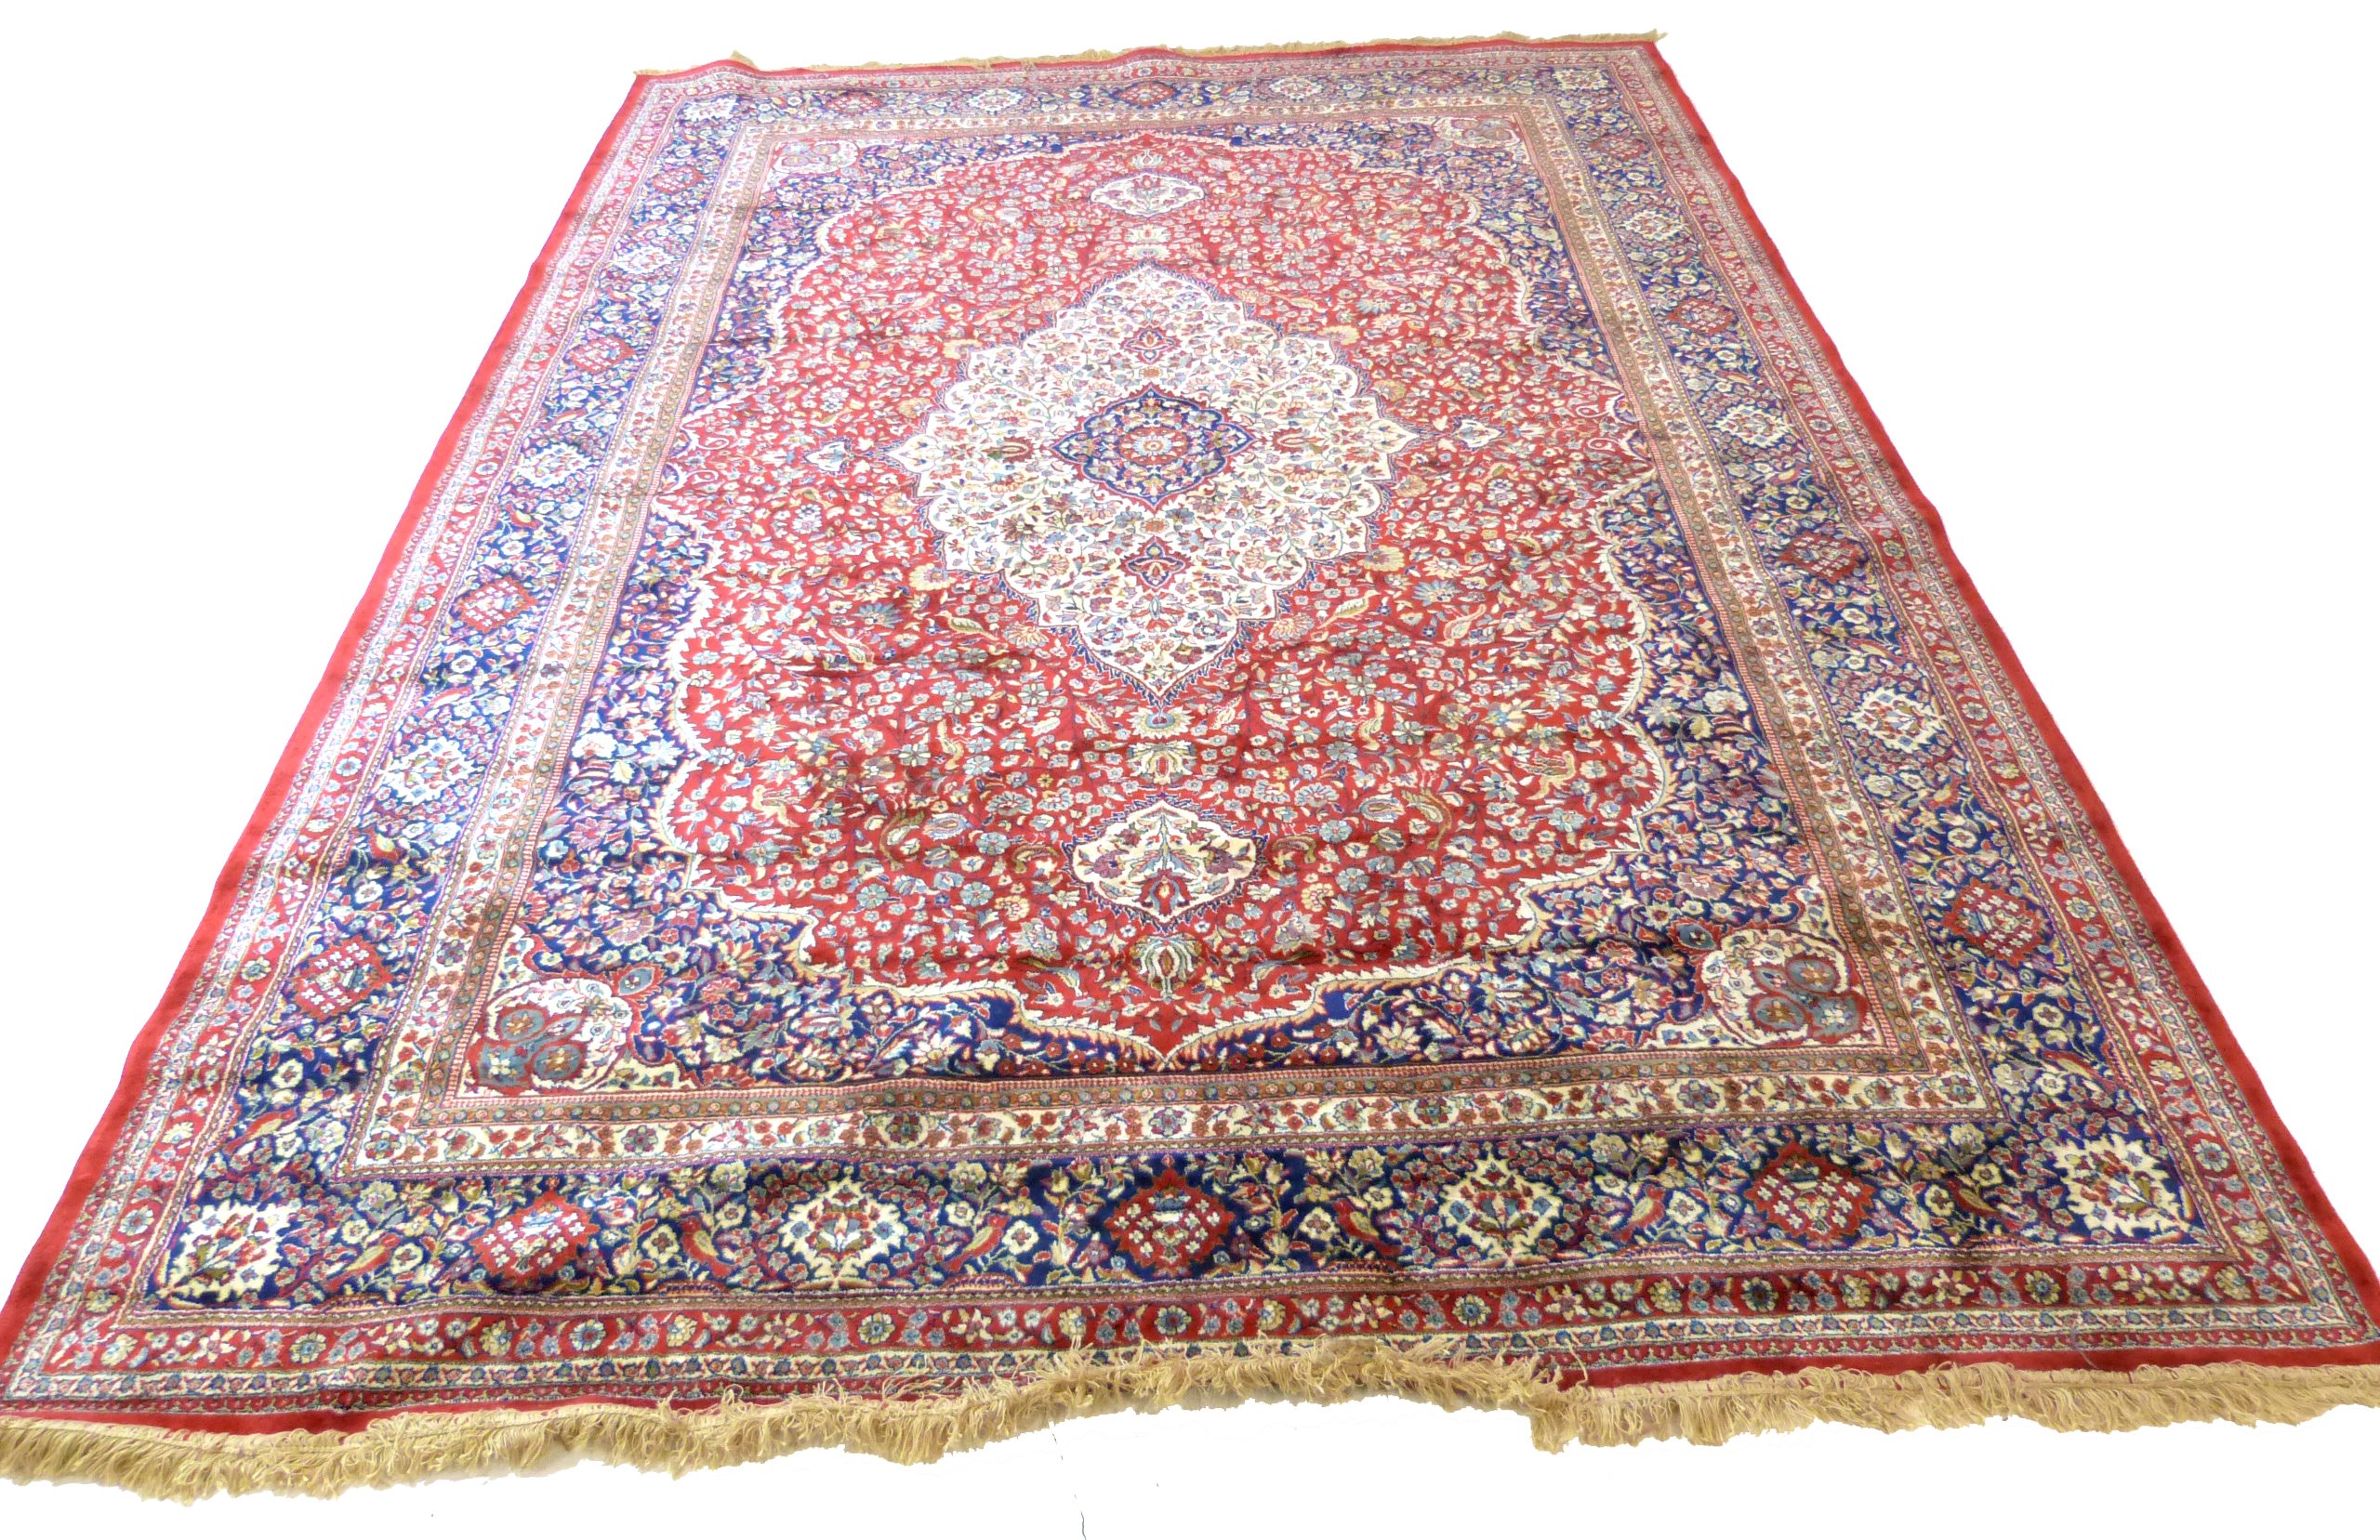 Large red ground full-pile Kashmir Carpet, floral medallion design, 340cm x 230 cm approx